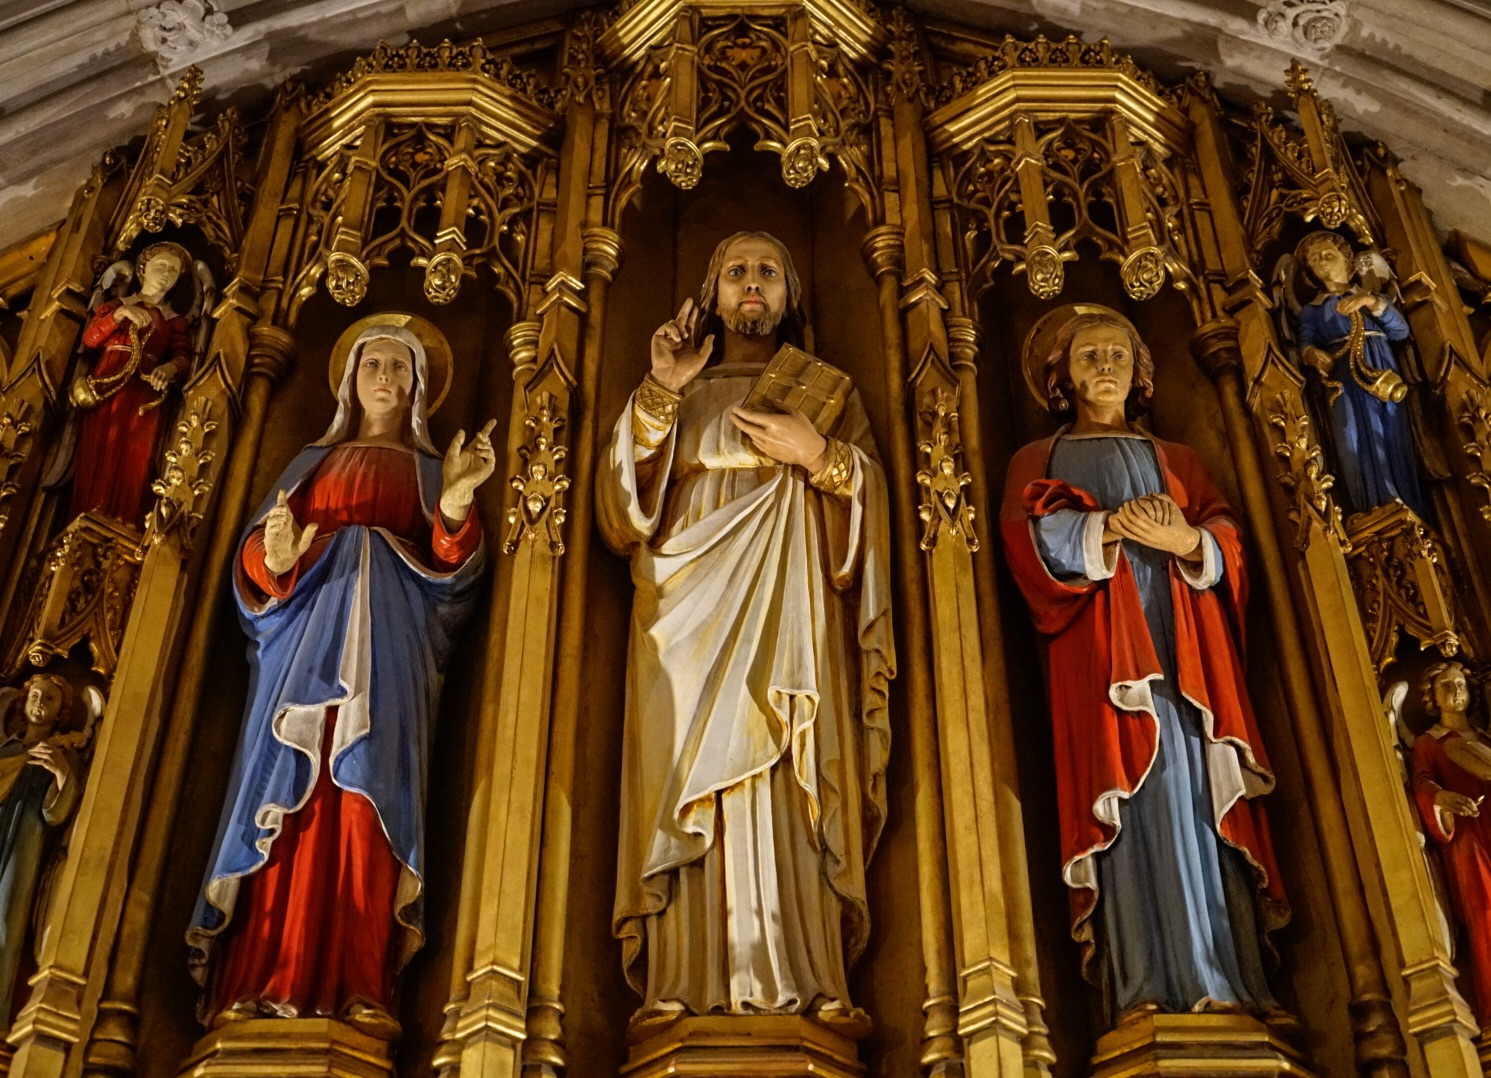 Amen National Cathedral, Washington D.C.